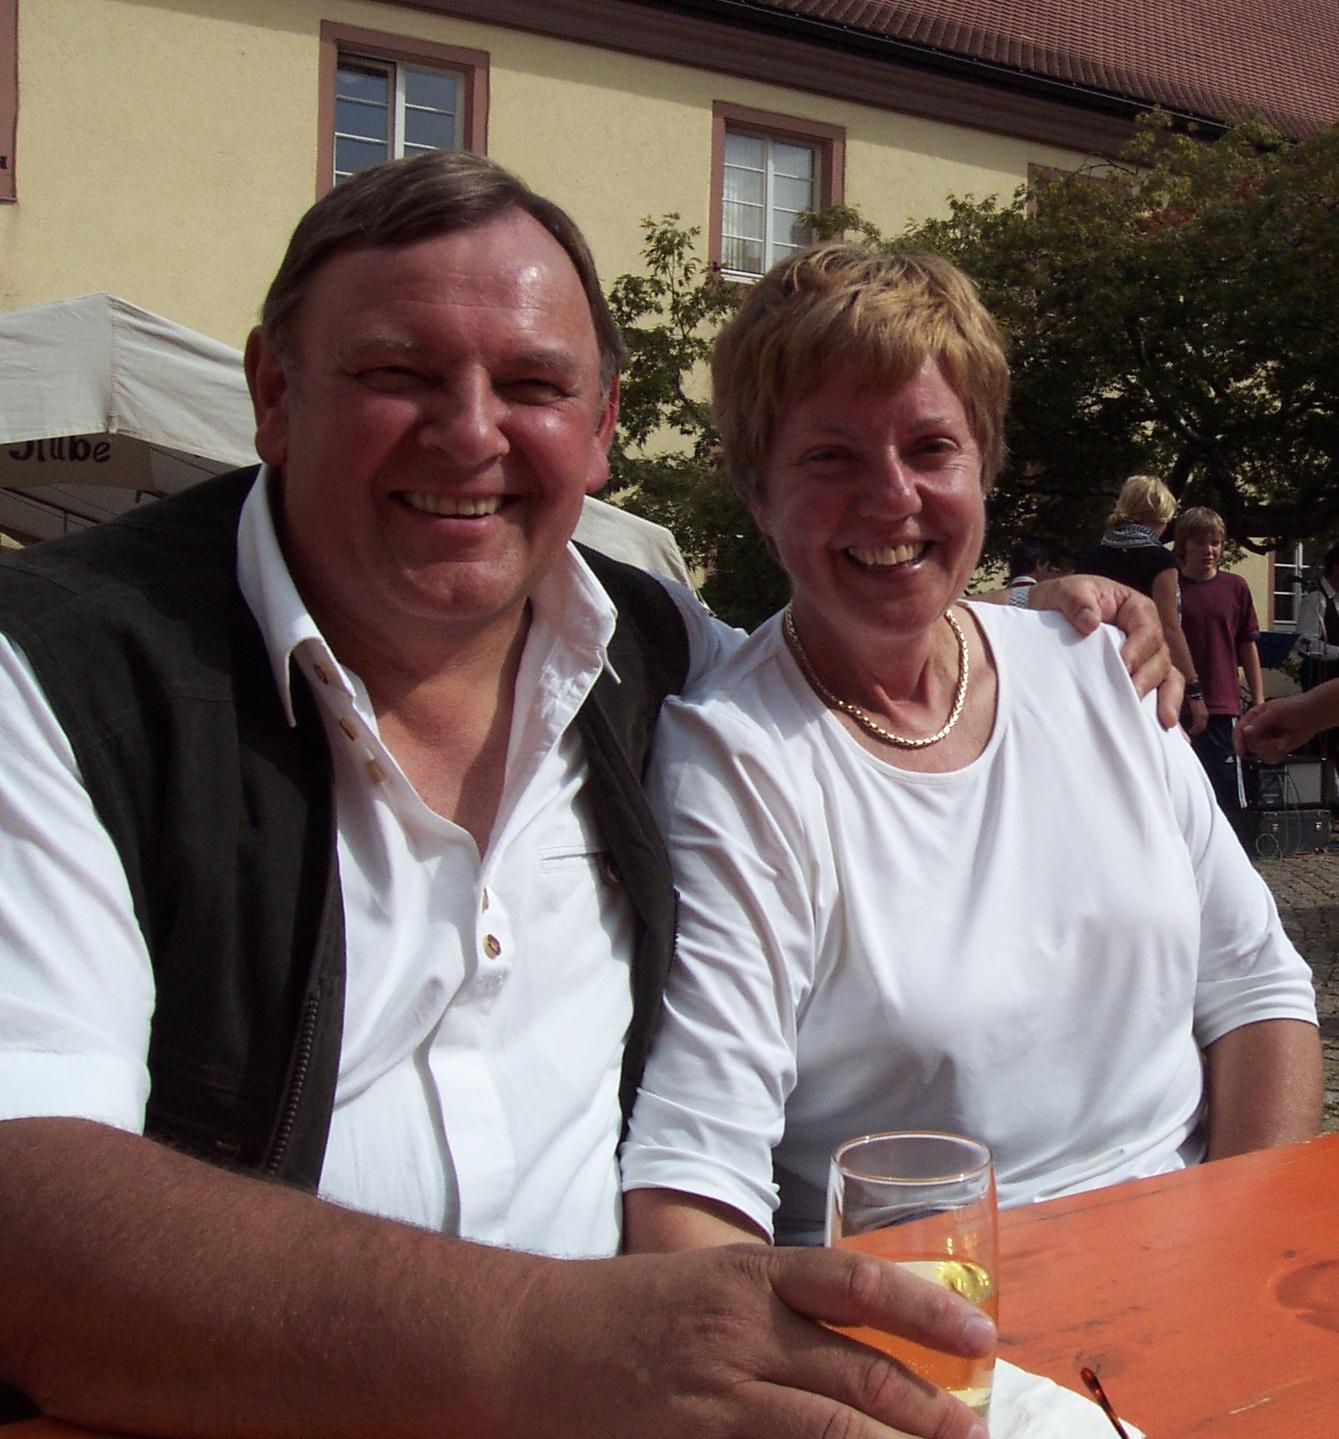 Roswitha & Linus Lorsbach